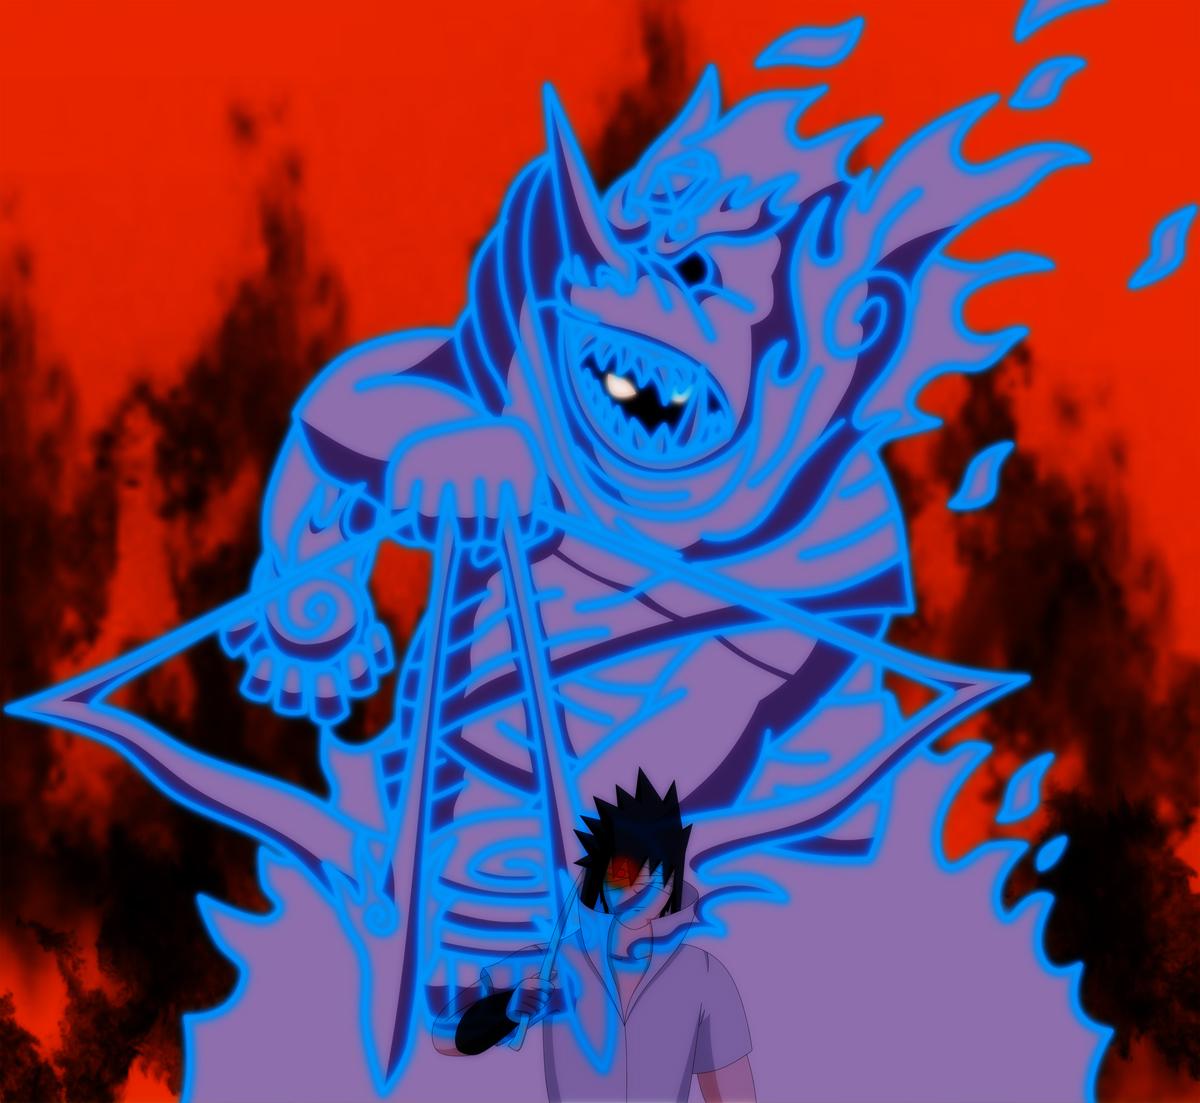 Sasuke Susanoo's New Form by ~MonkeyMan89 on deviantART